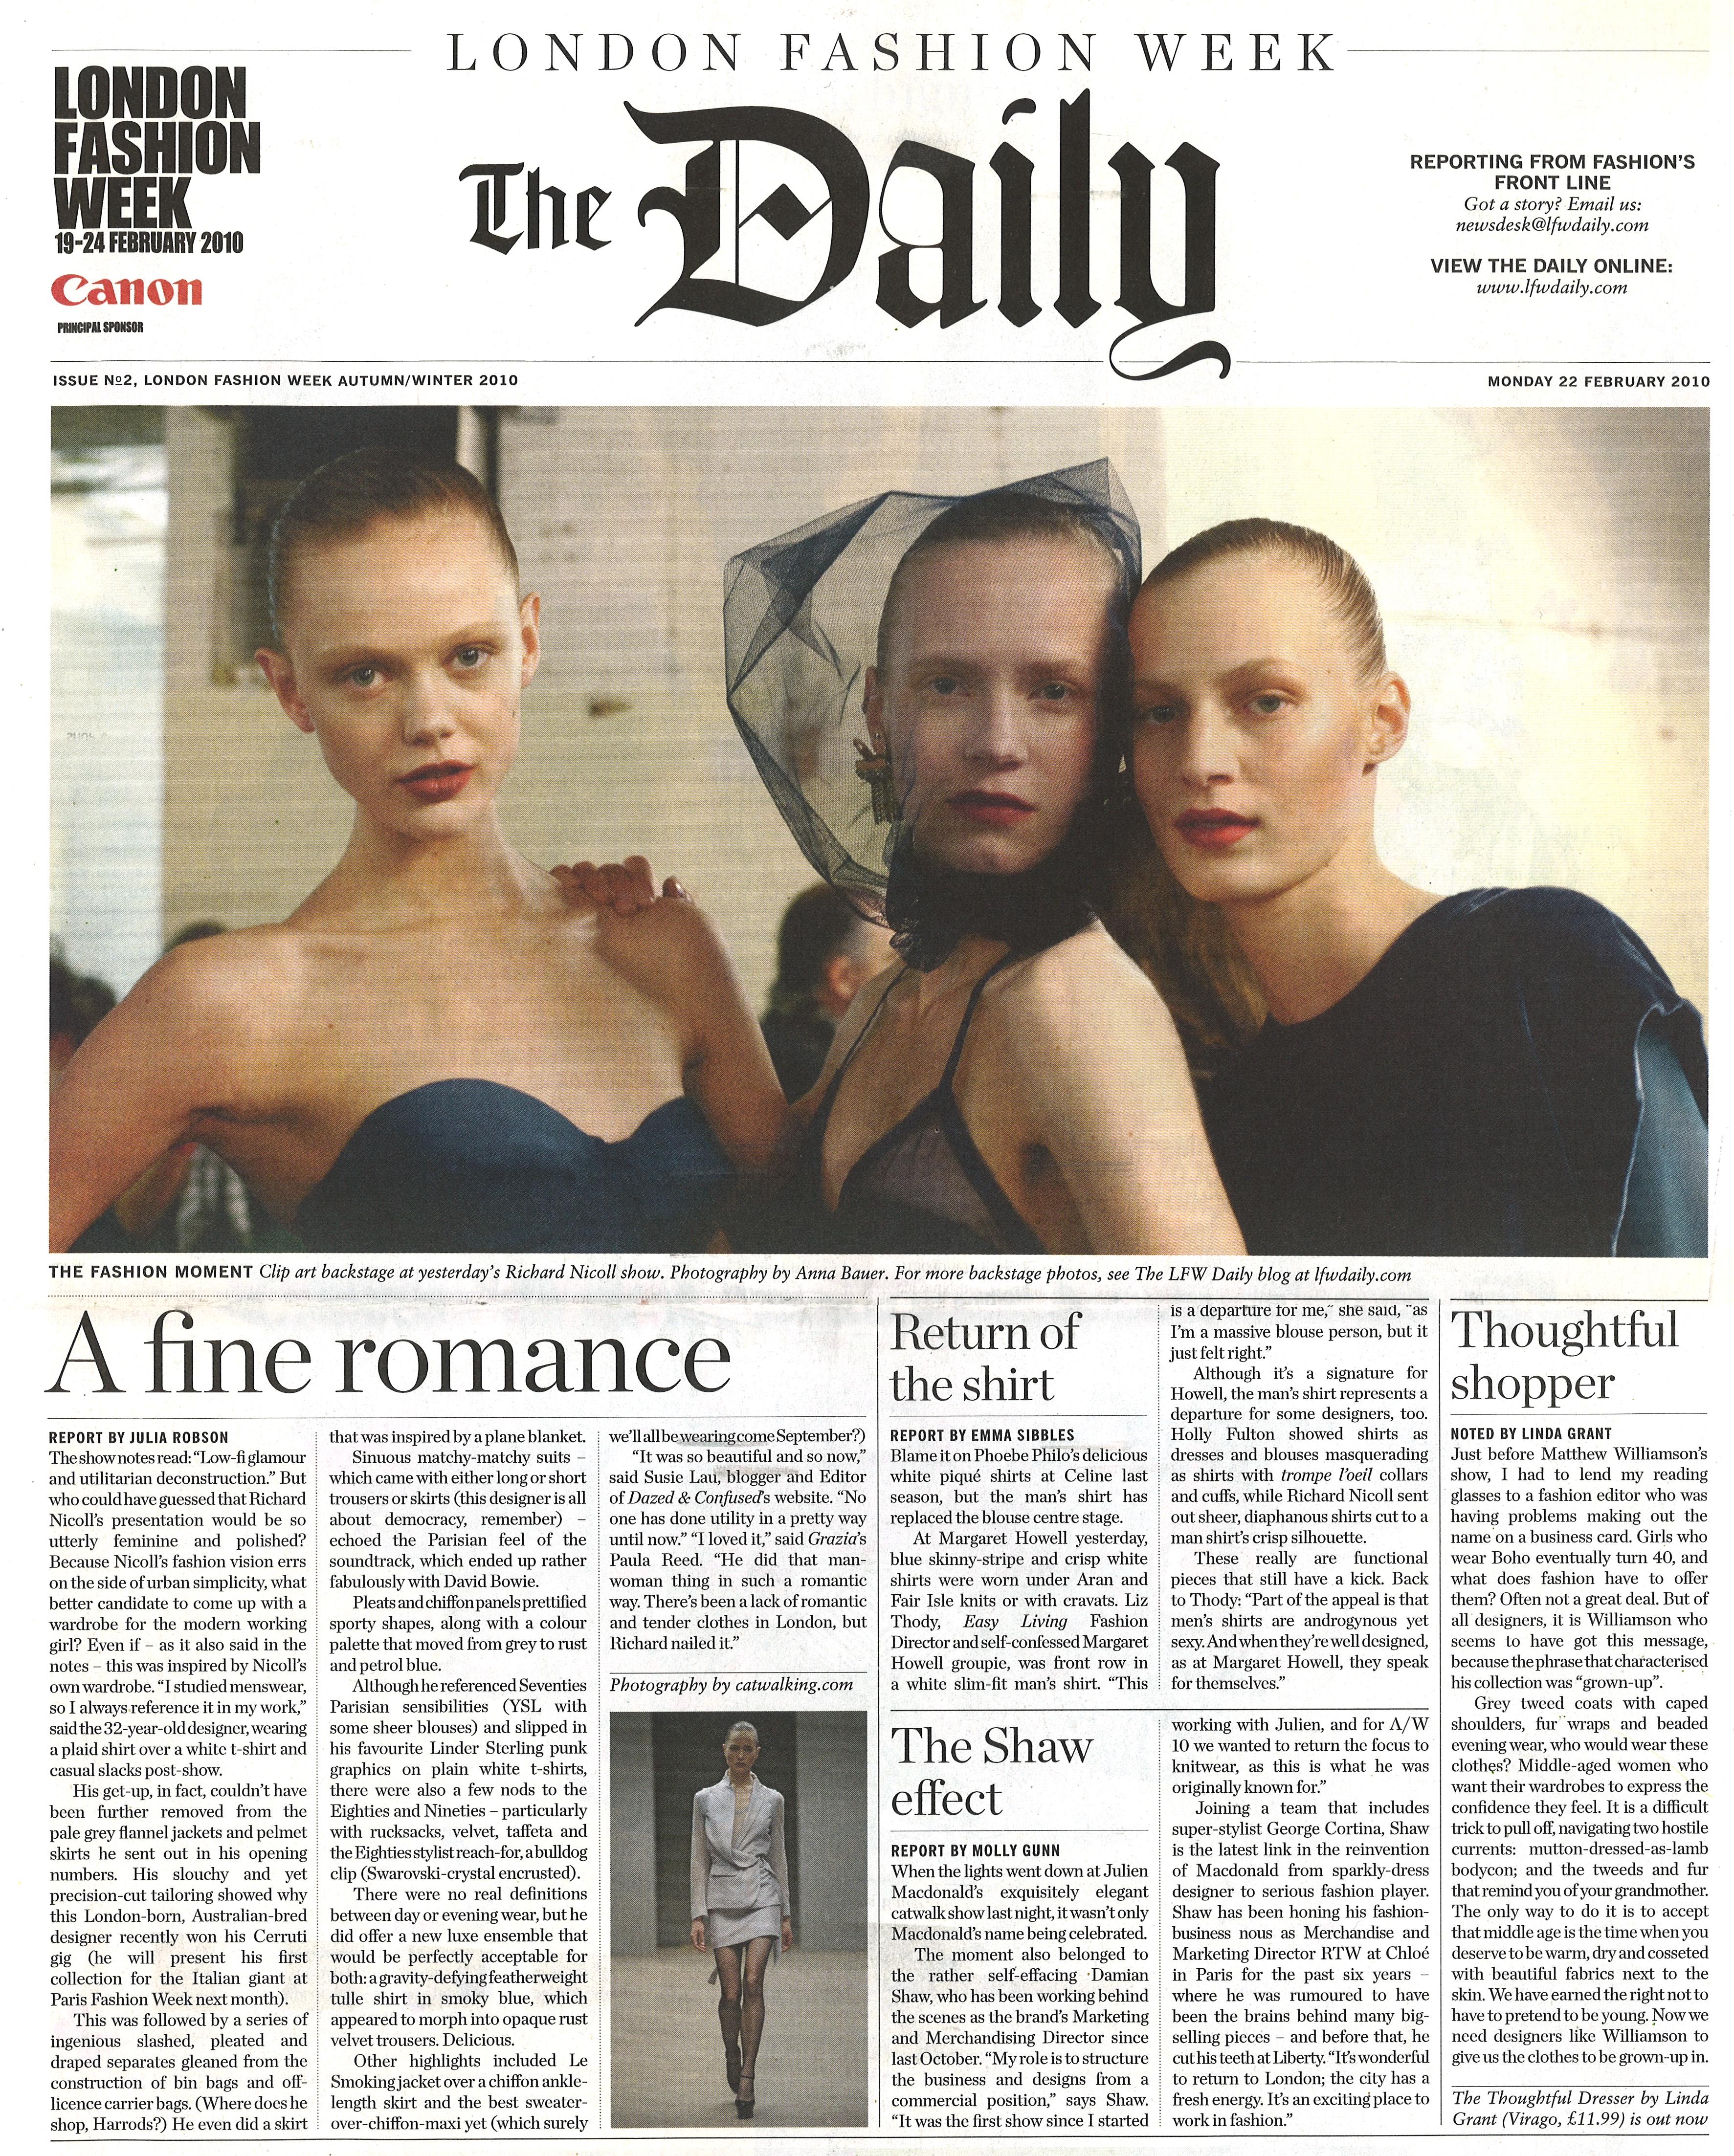 Julia-Robson-The-Daily-main-story-Feb-2010